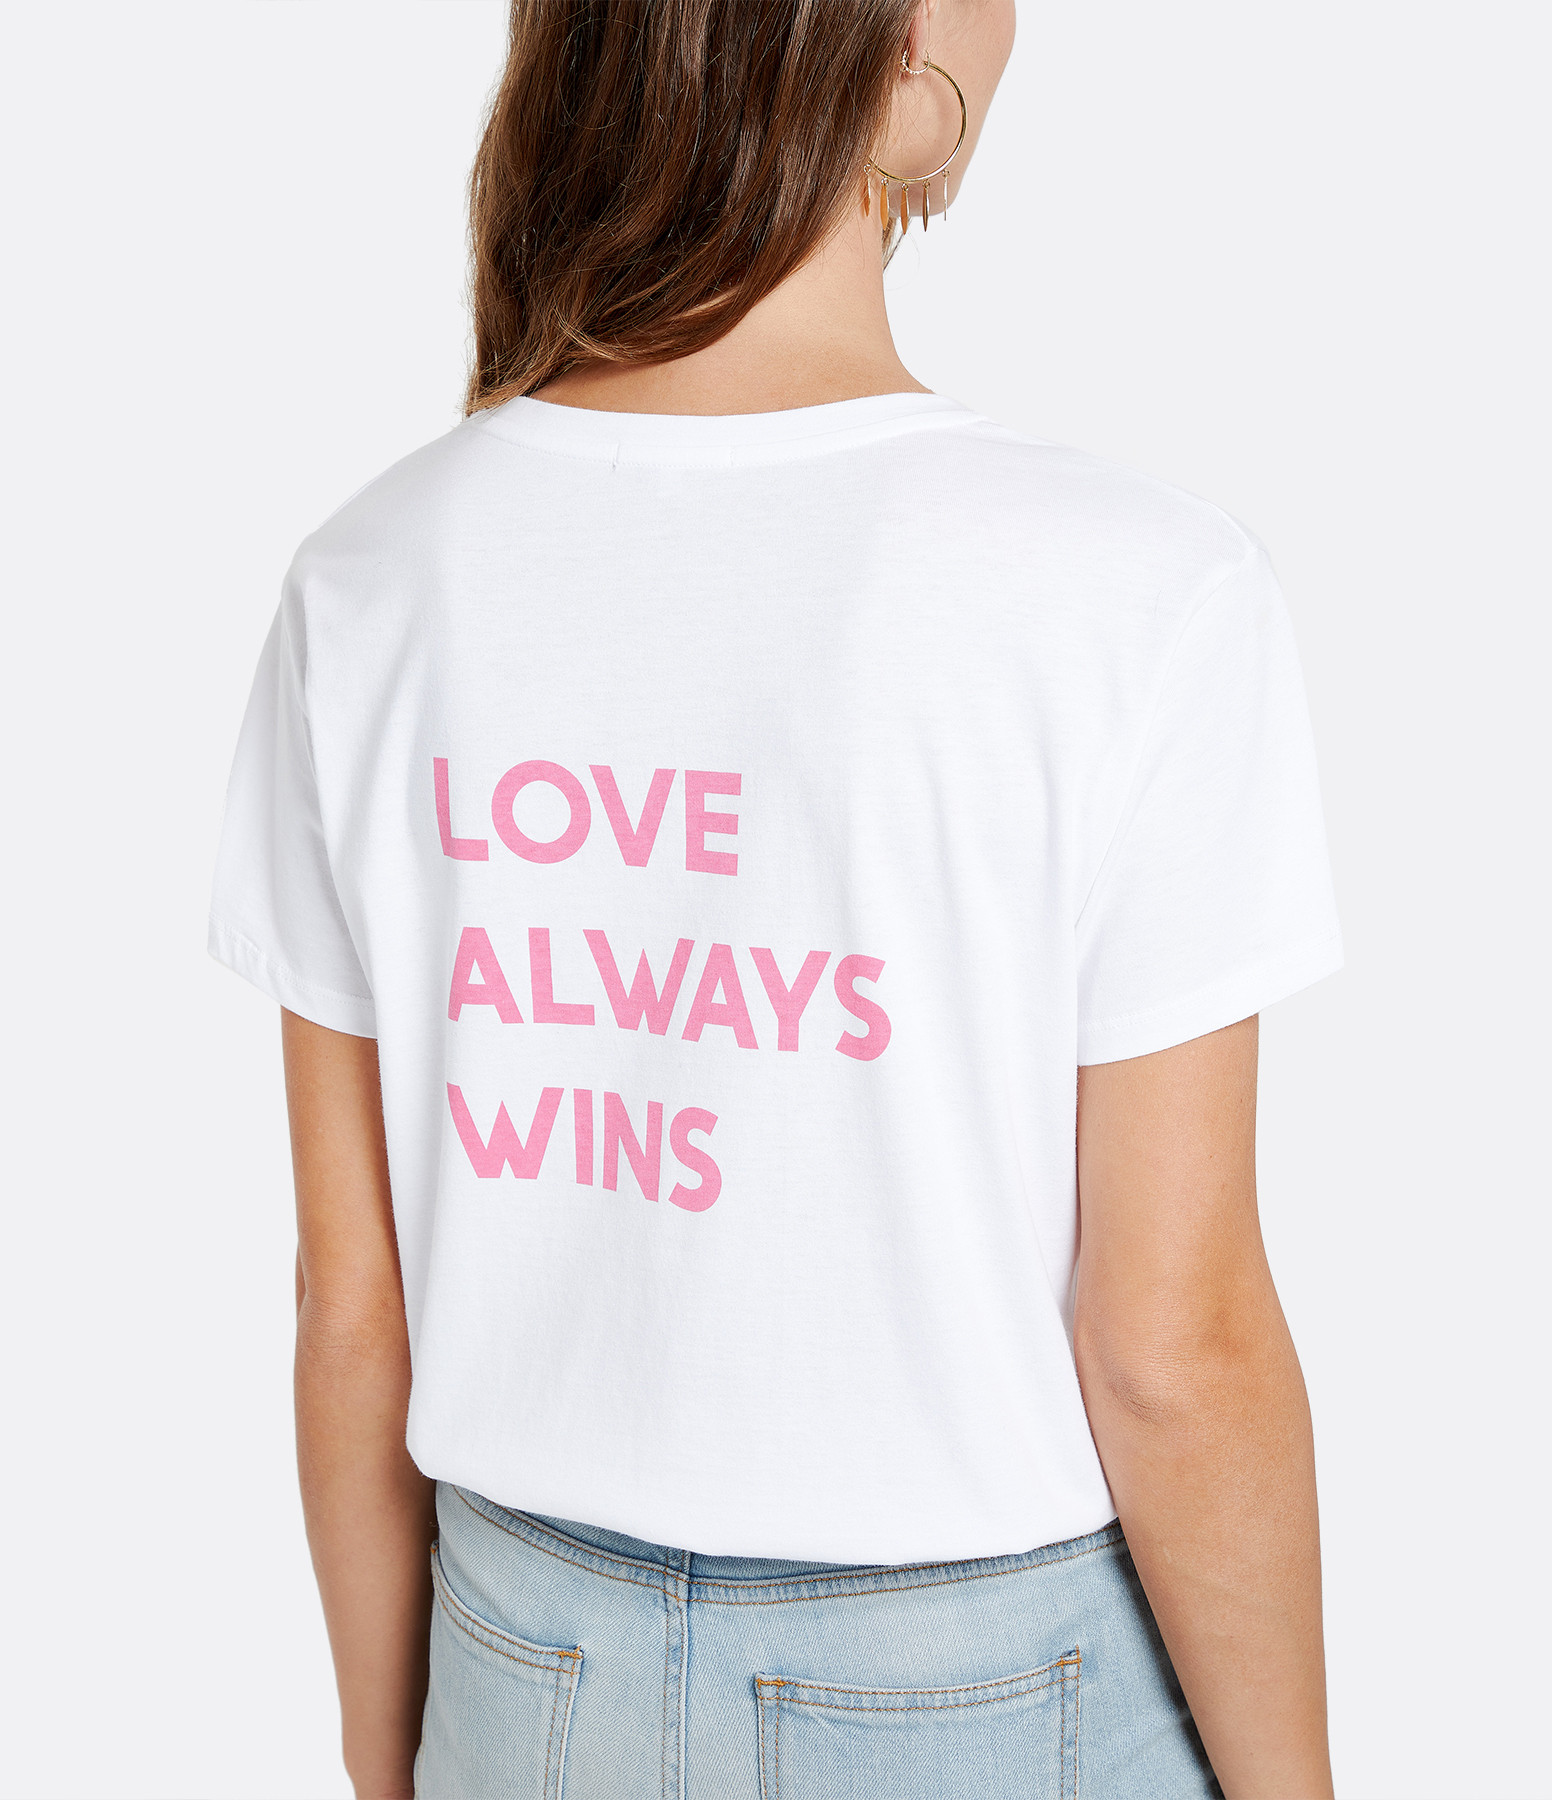 JEANNE VOULAND - Tee-shirt Ela Love Always Wins Coton Blanc Rose